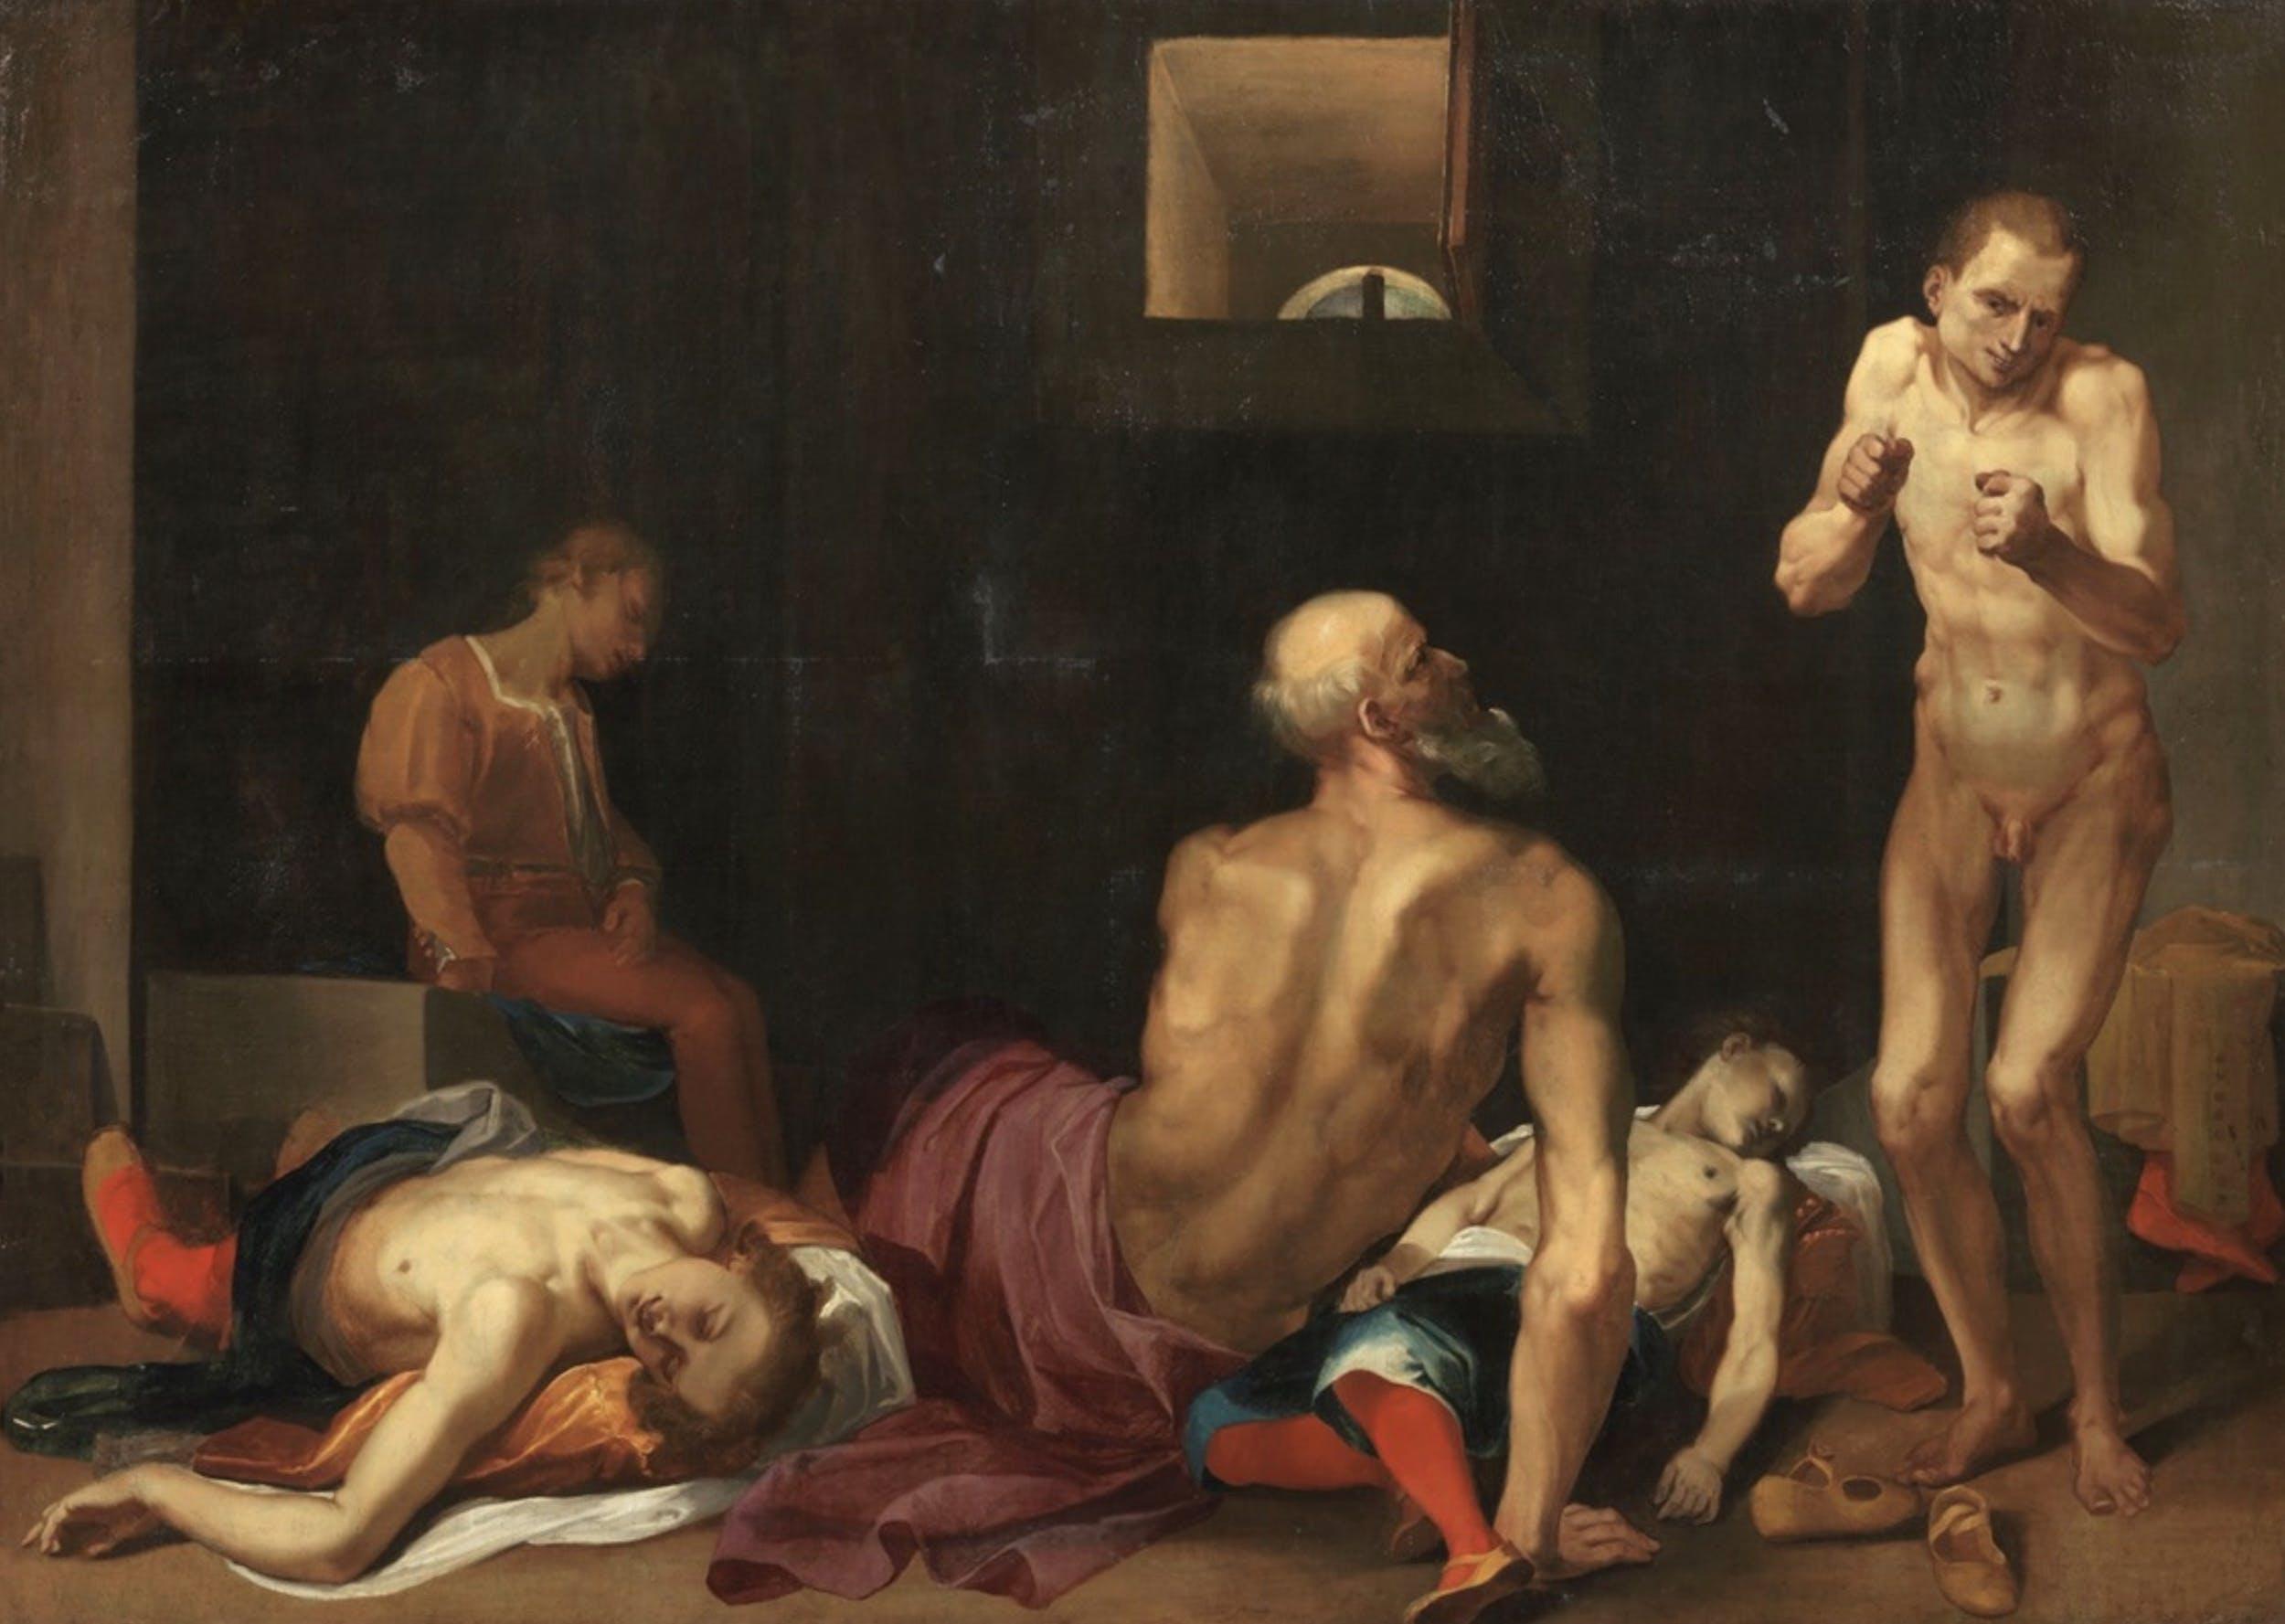 Fra' Arsenio, Conte Ugolino